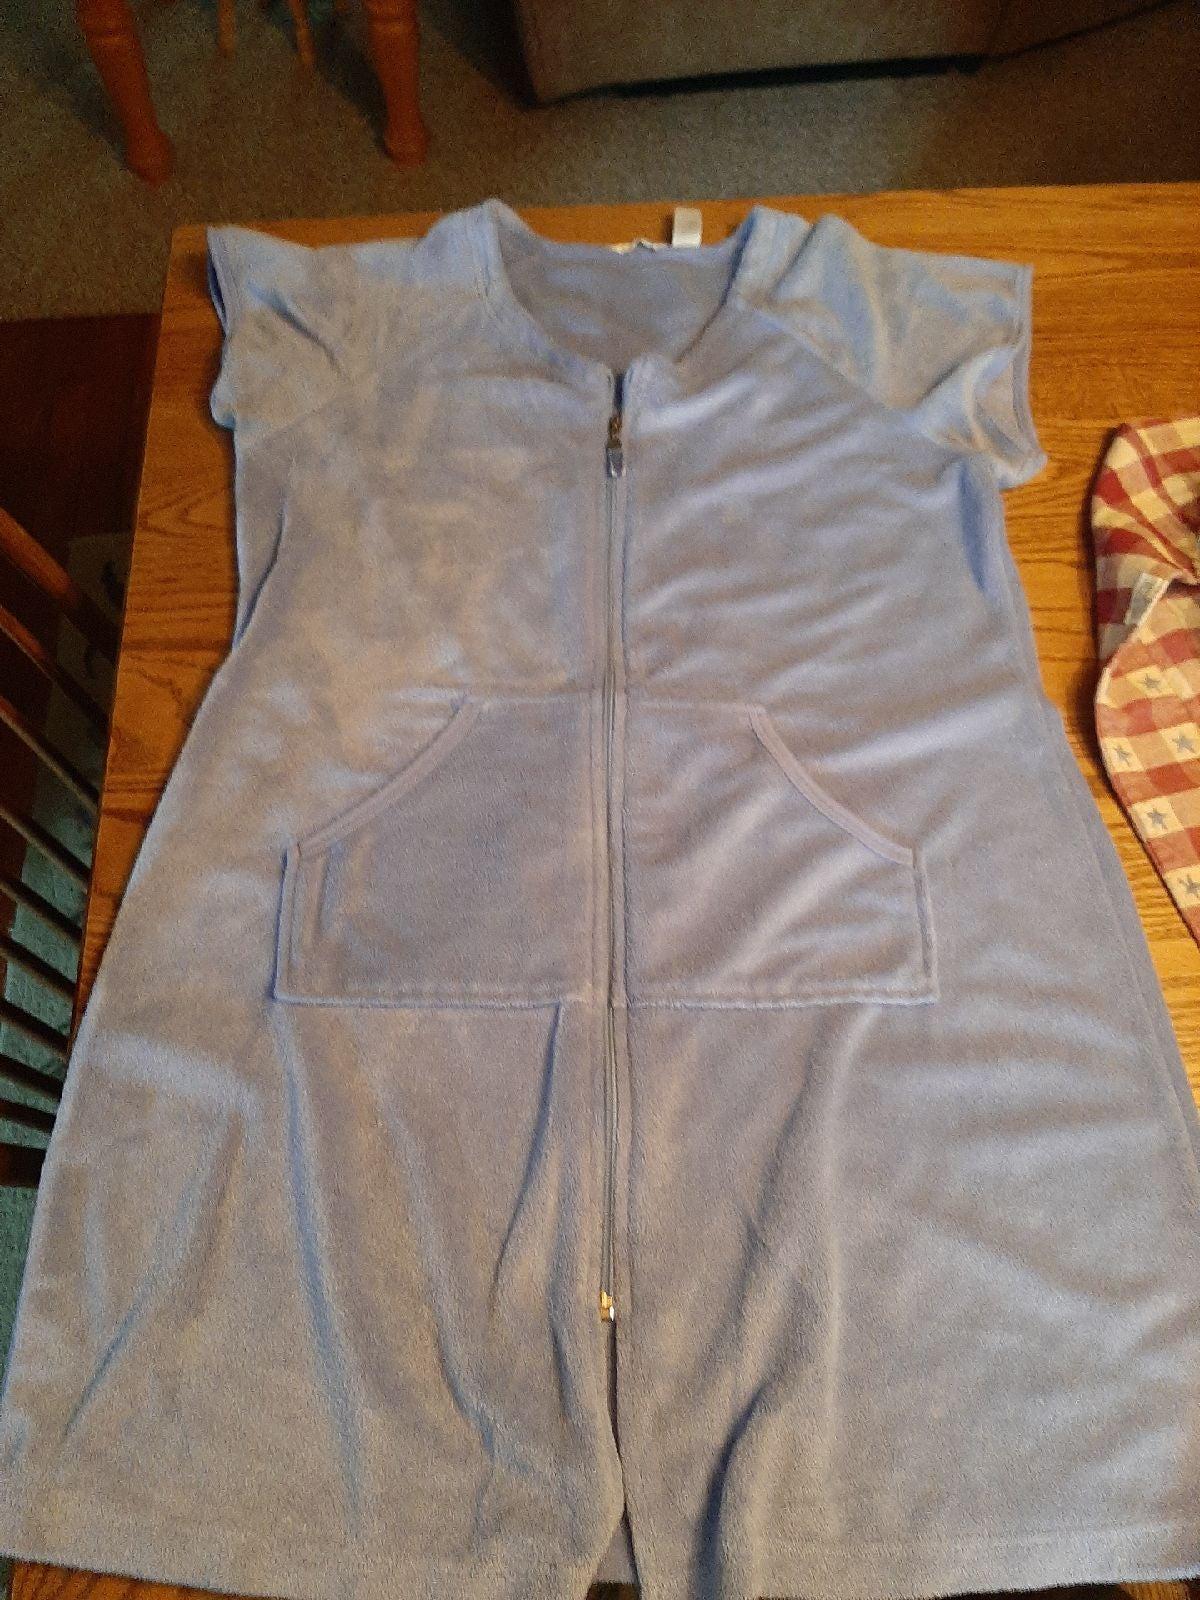 Terricloth short robe